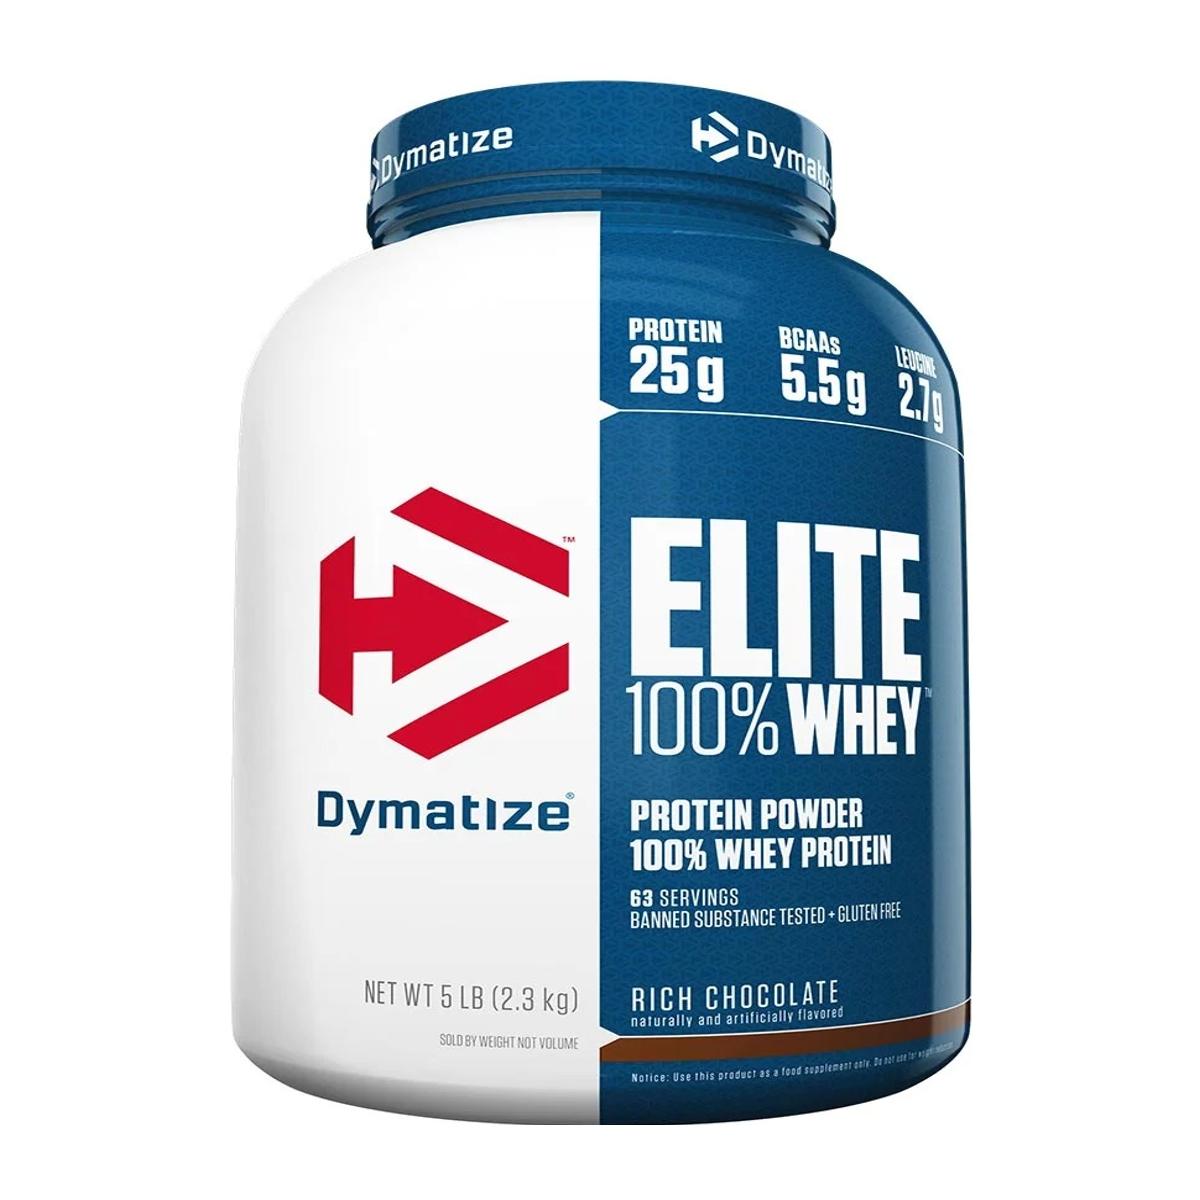 612637008Dymatize-elite-whey-protein-5lb2.png